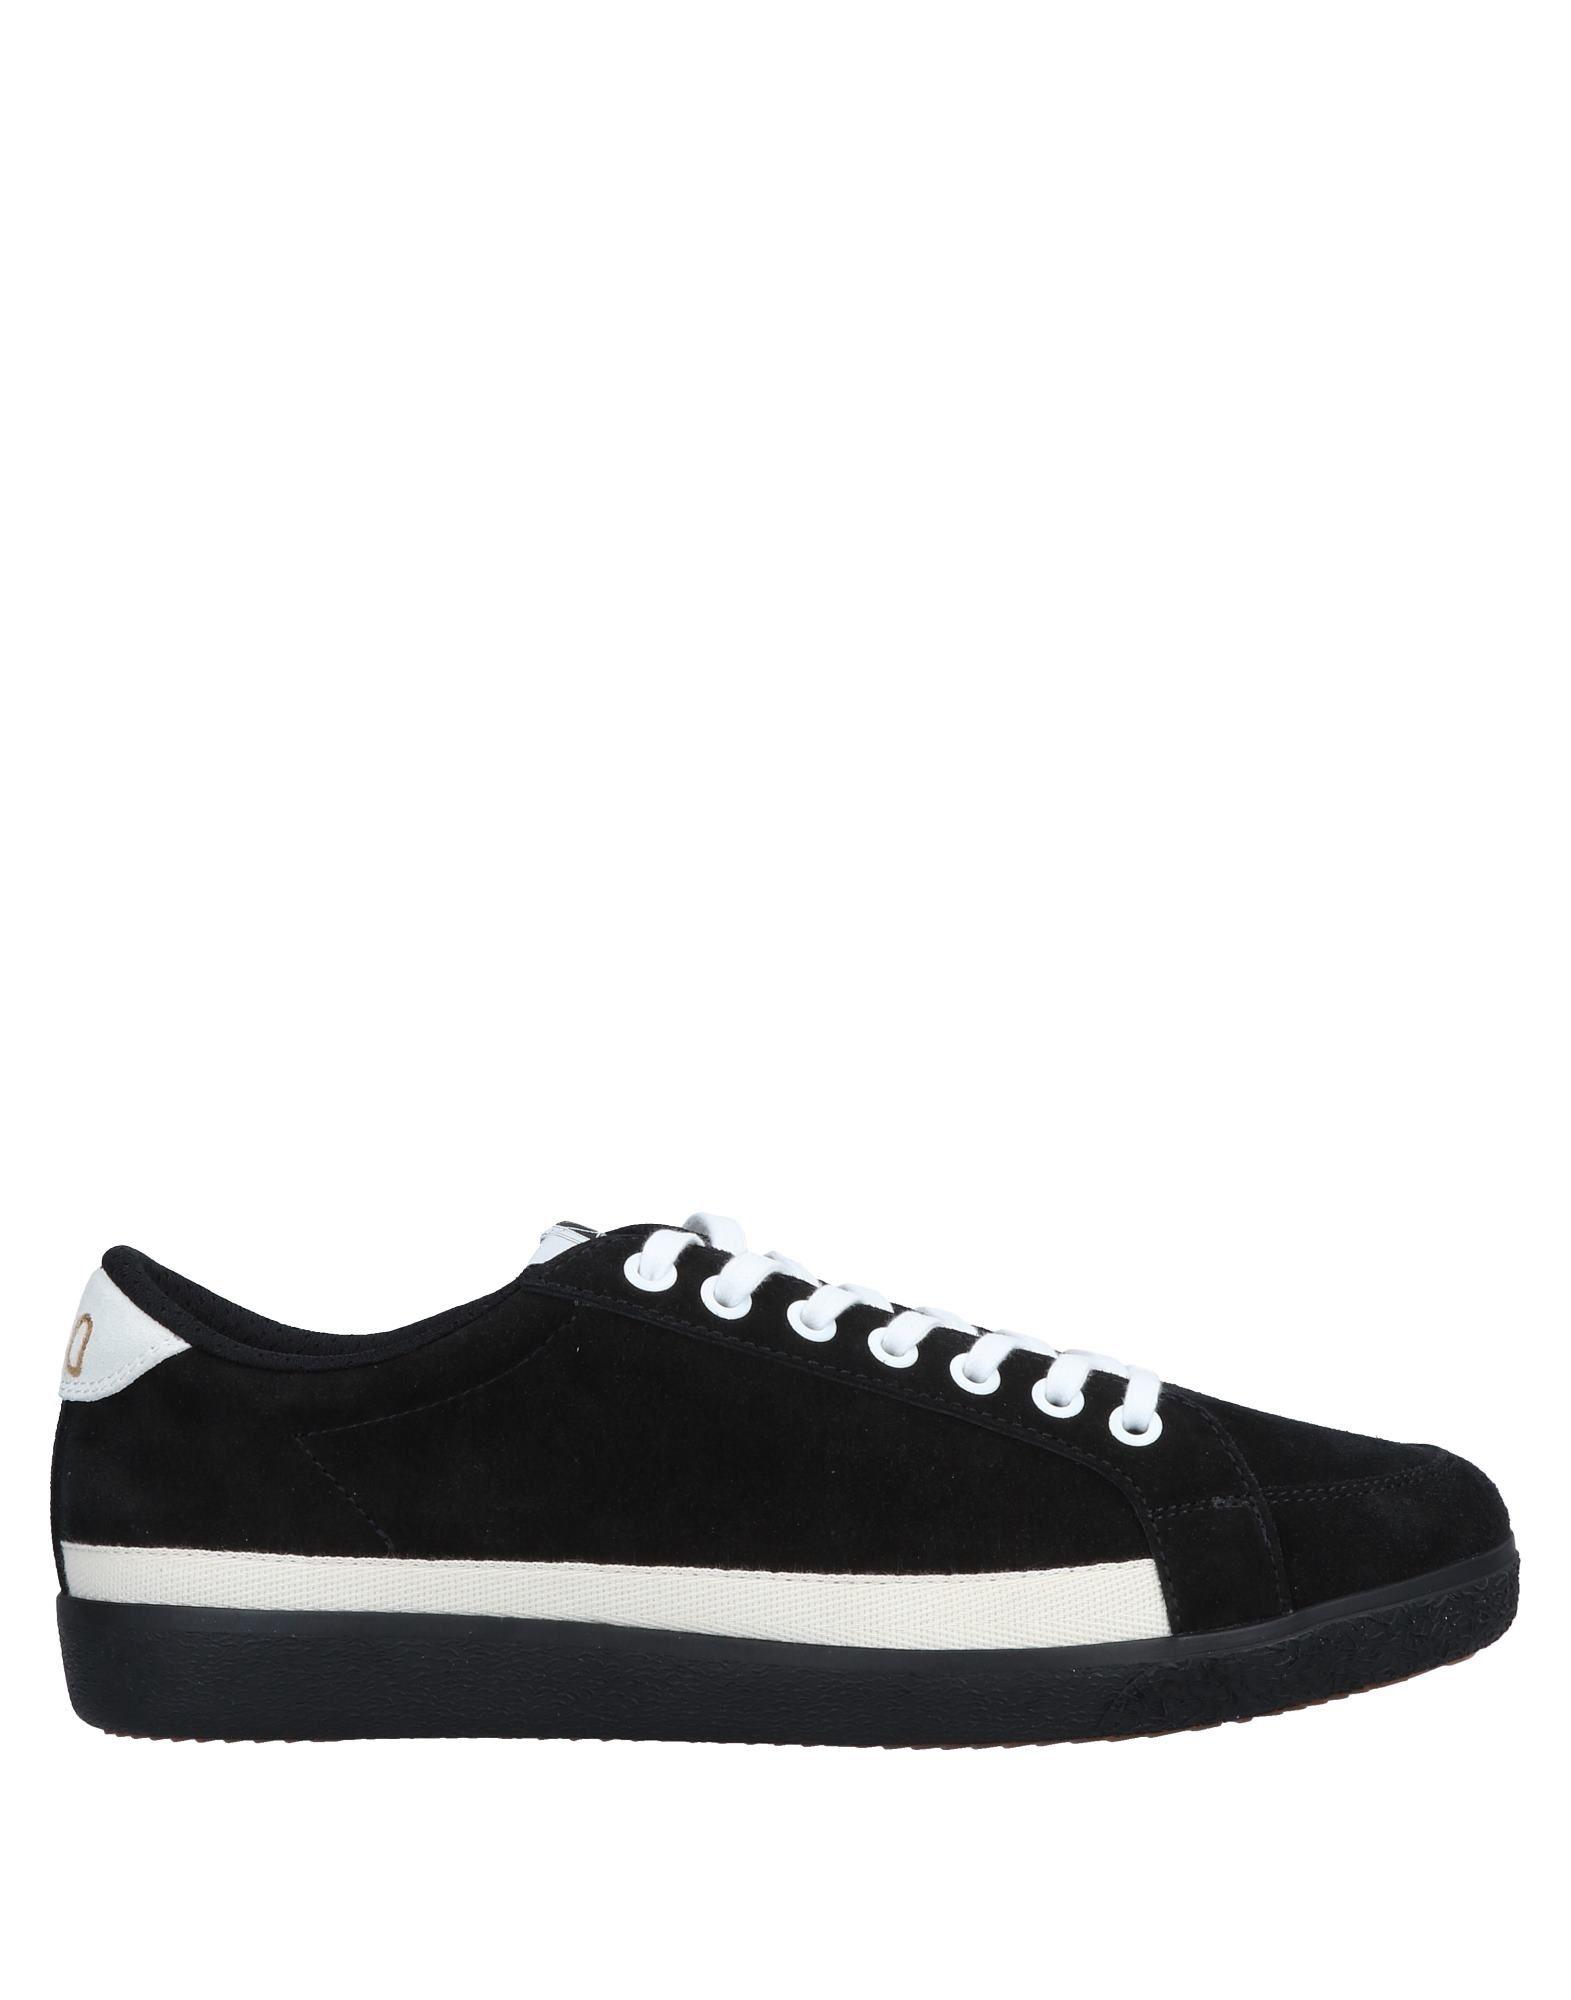 Pantofola on D'oro Sneakers - Men Pantofola D'oro Sneakers online on Pantofola  Canada - 11569863WA 2db261